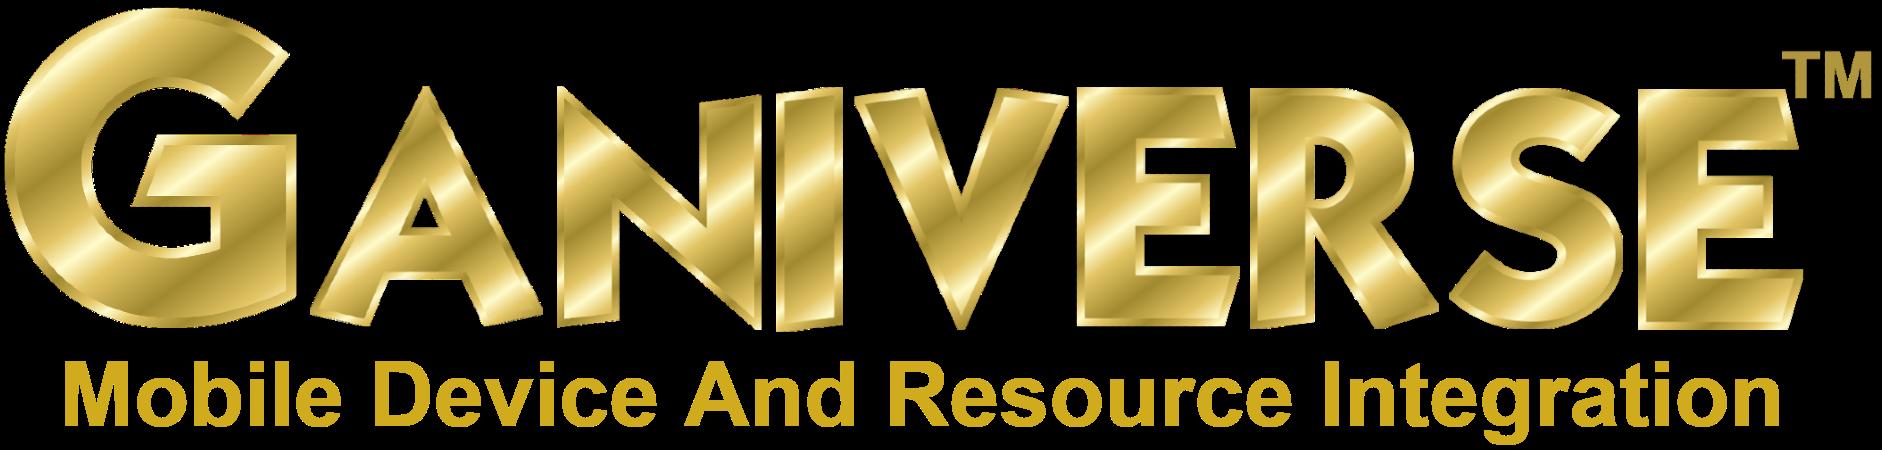 Ganiverse.com